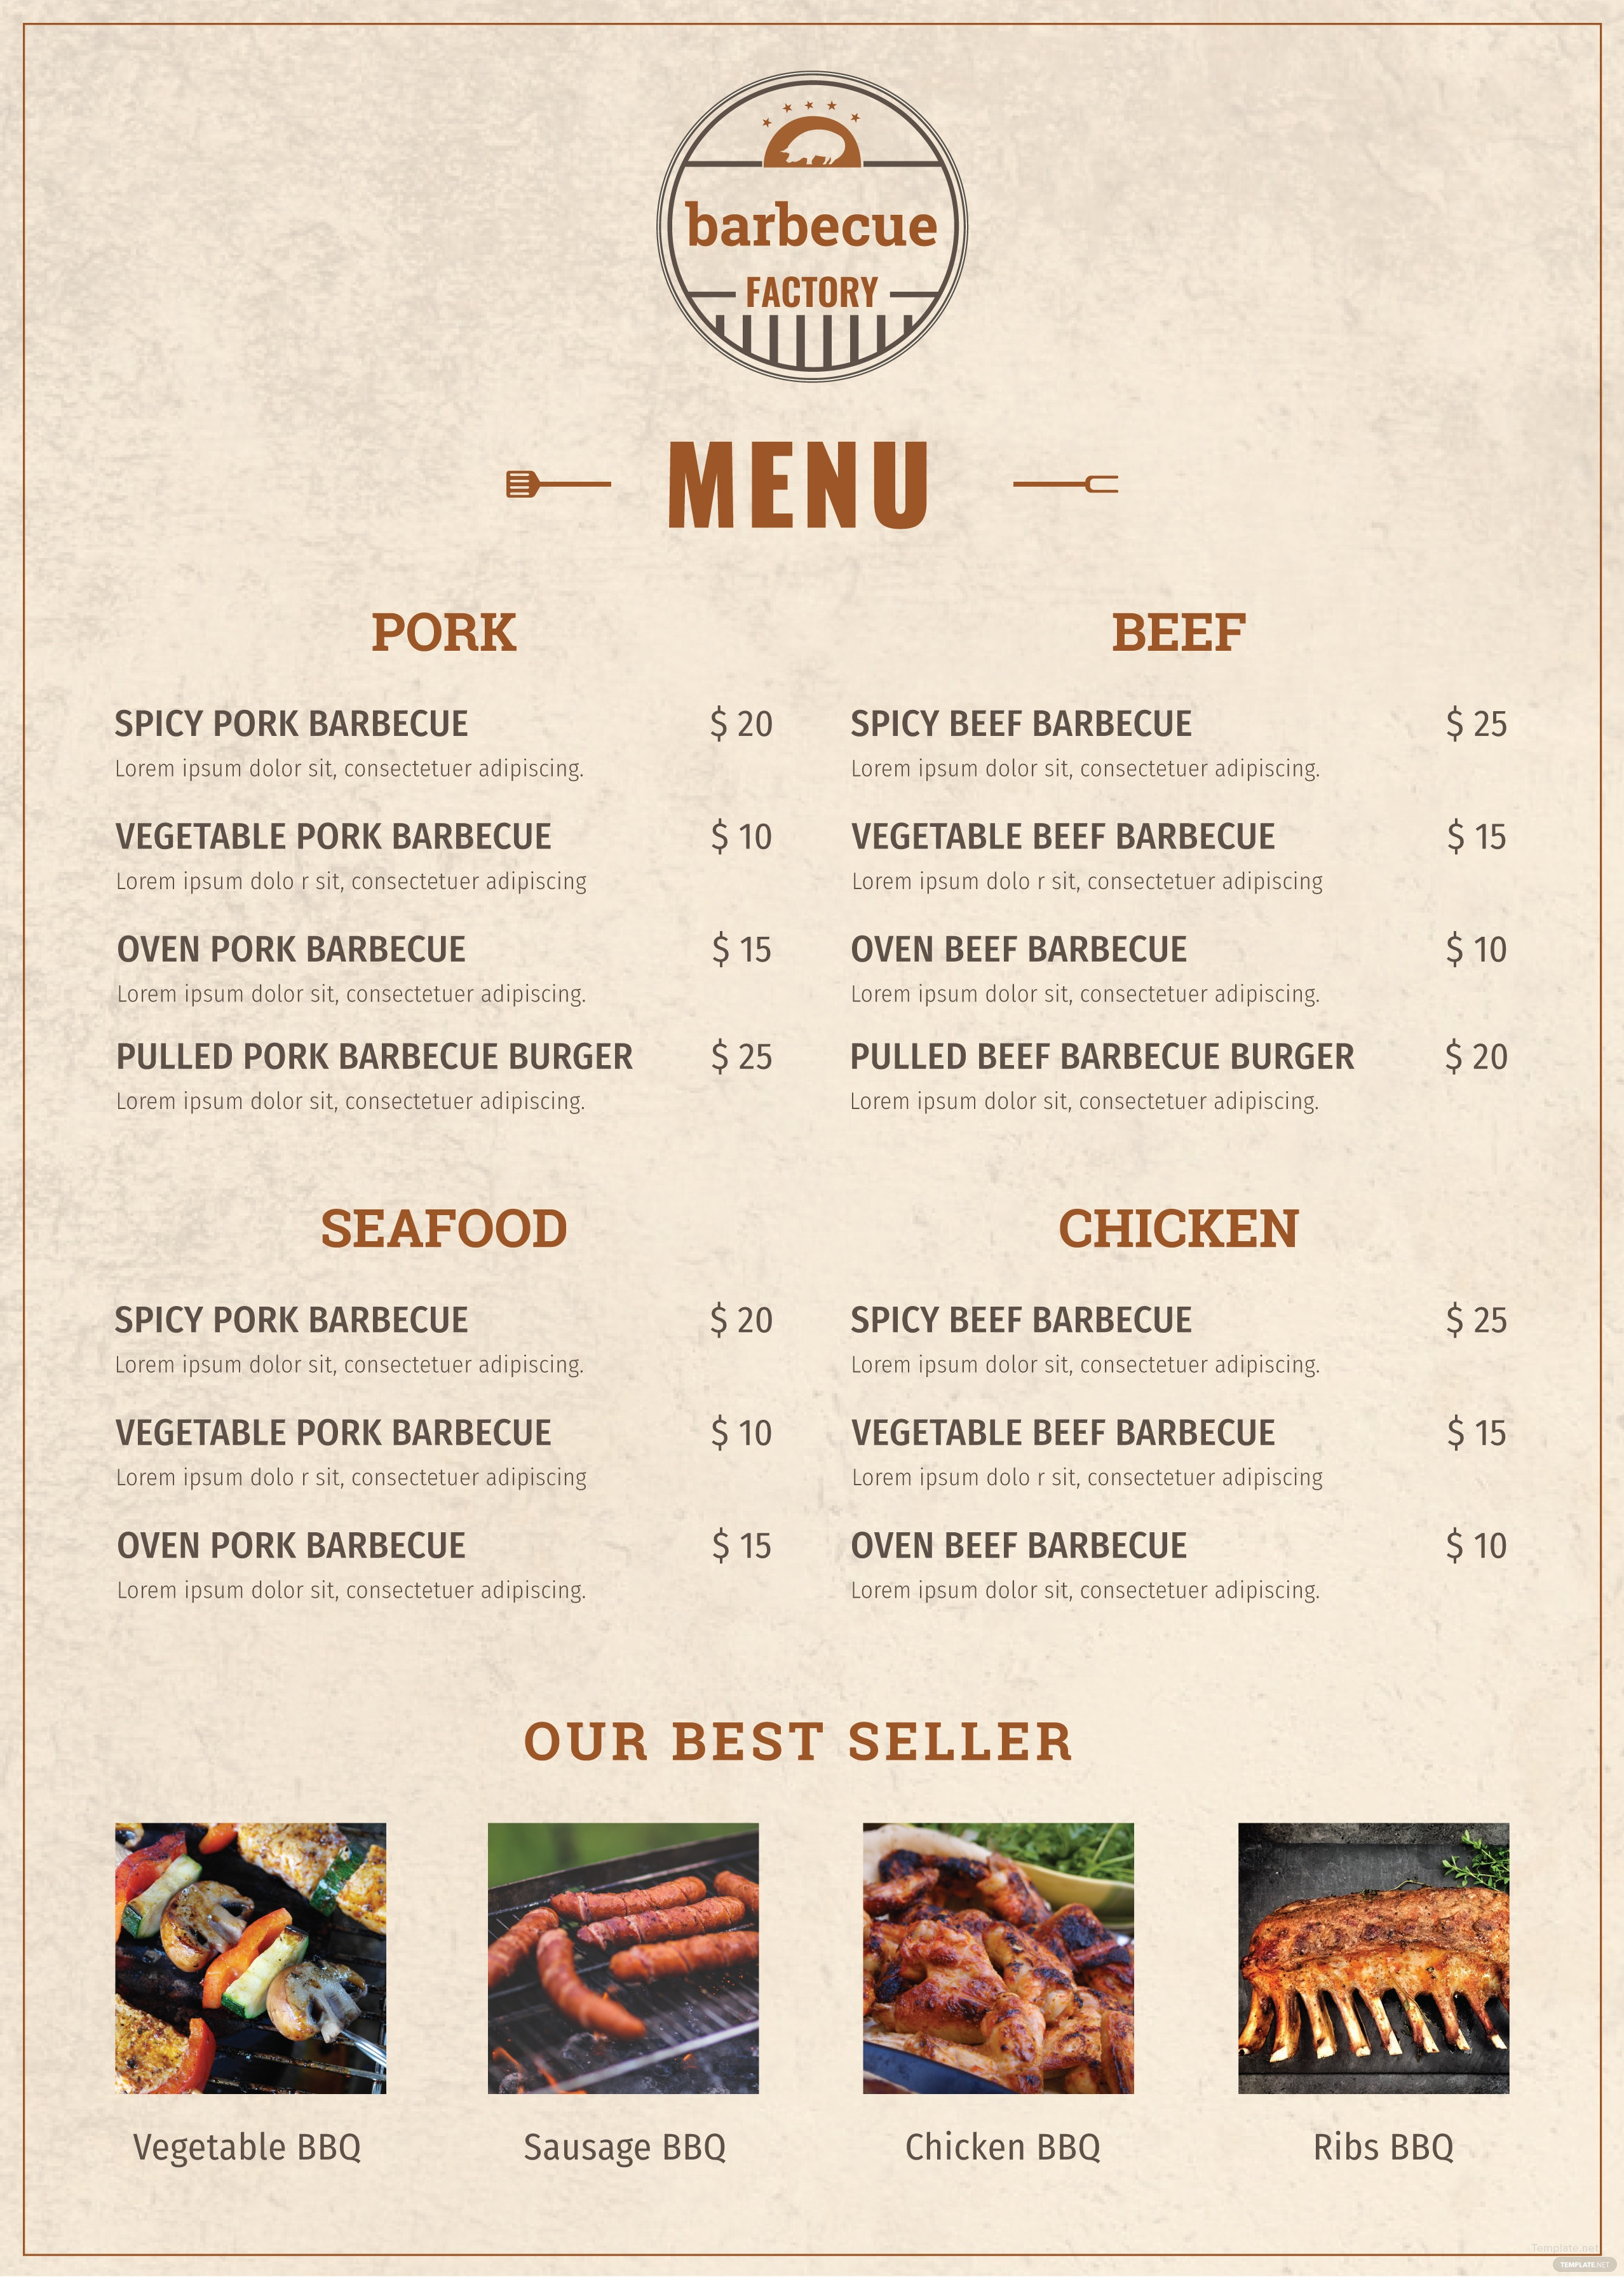 free minimal barbecue menu template in adobe photoshop  illustrator  microsoft word  publisher